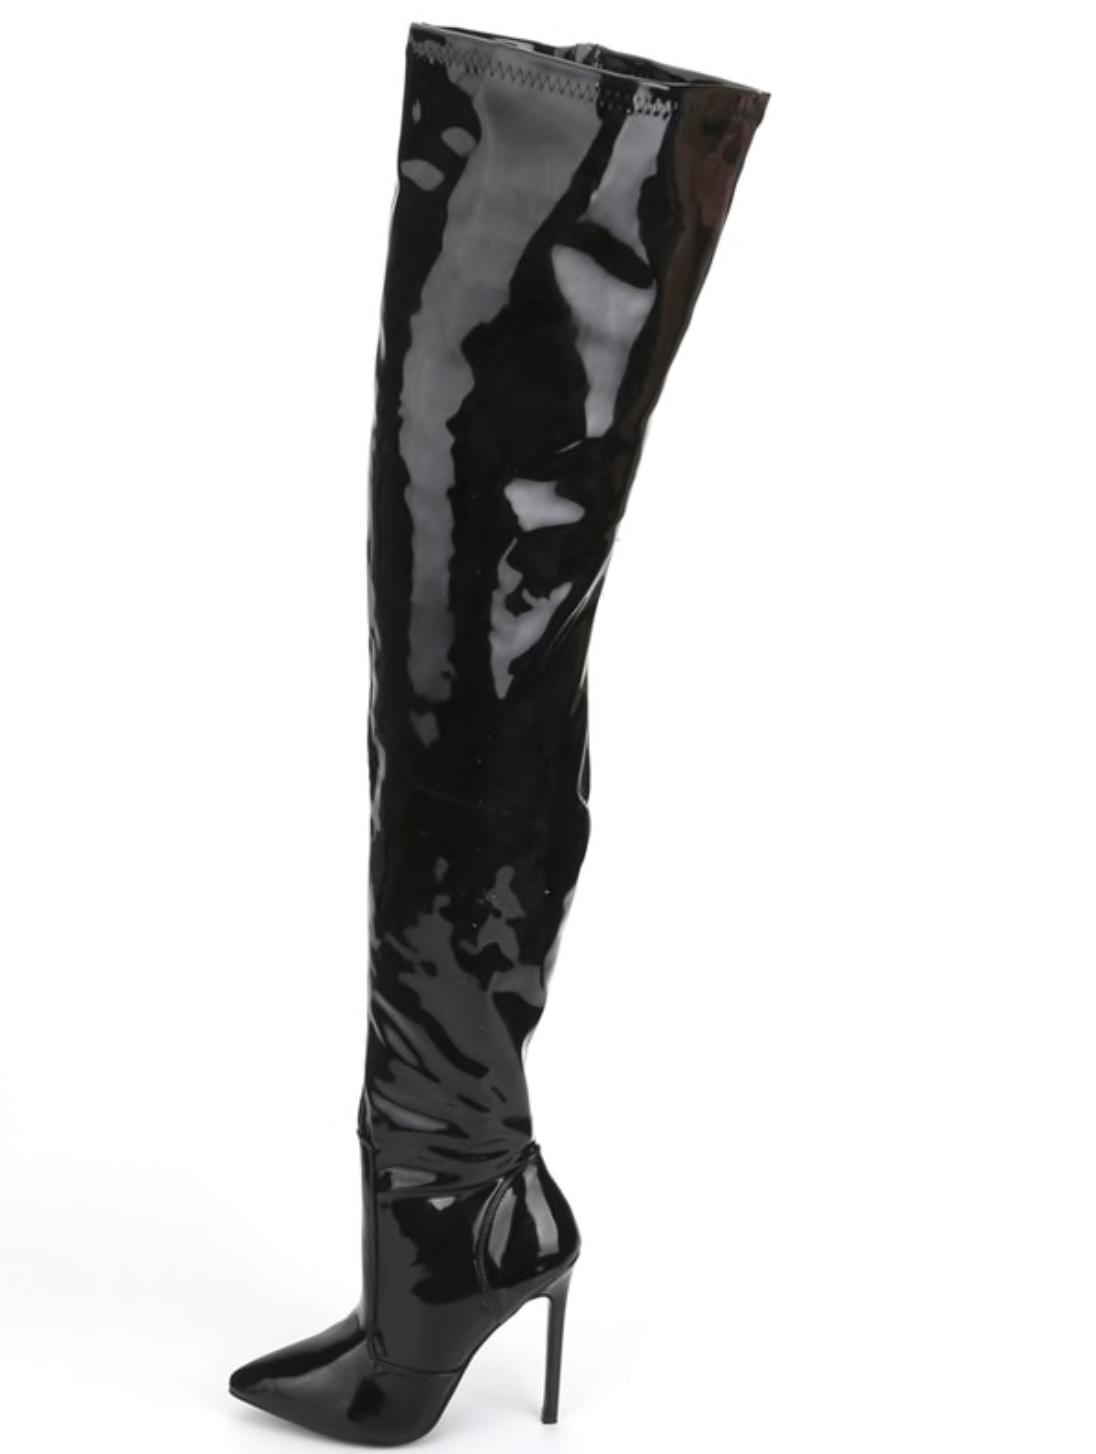 "Extreme thigh high heel stiletto fetish patent 12cm 4.5"" boots UK3-13 4"